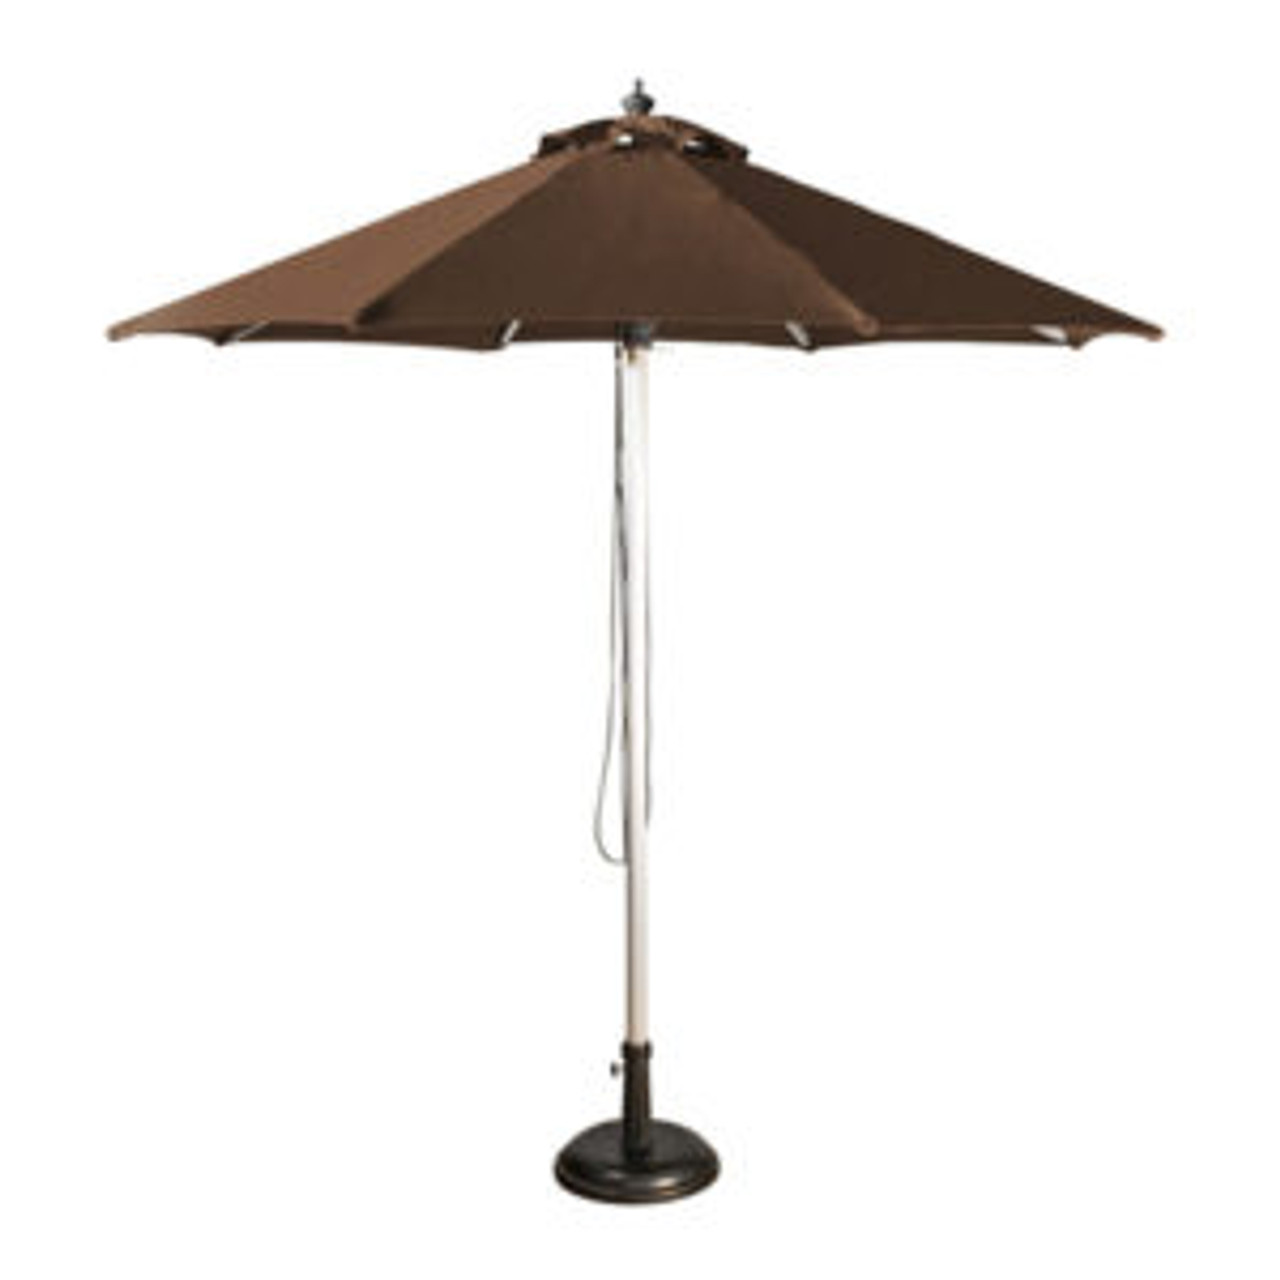 2.5m Round Market Umbrella - Aluminium Frame with  Planosol Shade( Single colour)